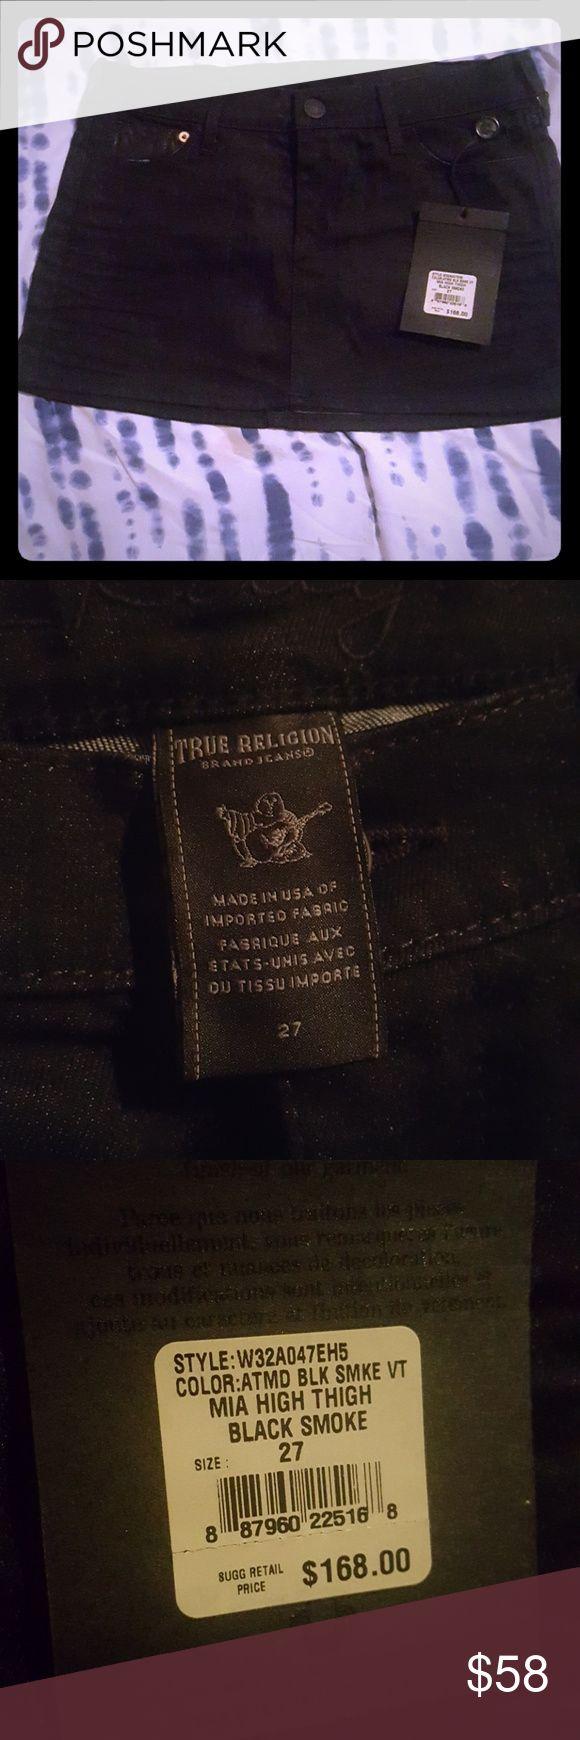 True Religion MIA Thigh high skirt Mini Black Jean Skirt True Religion Skirts Mini